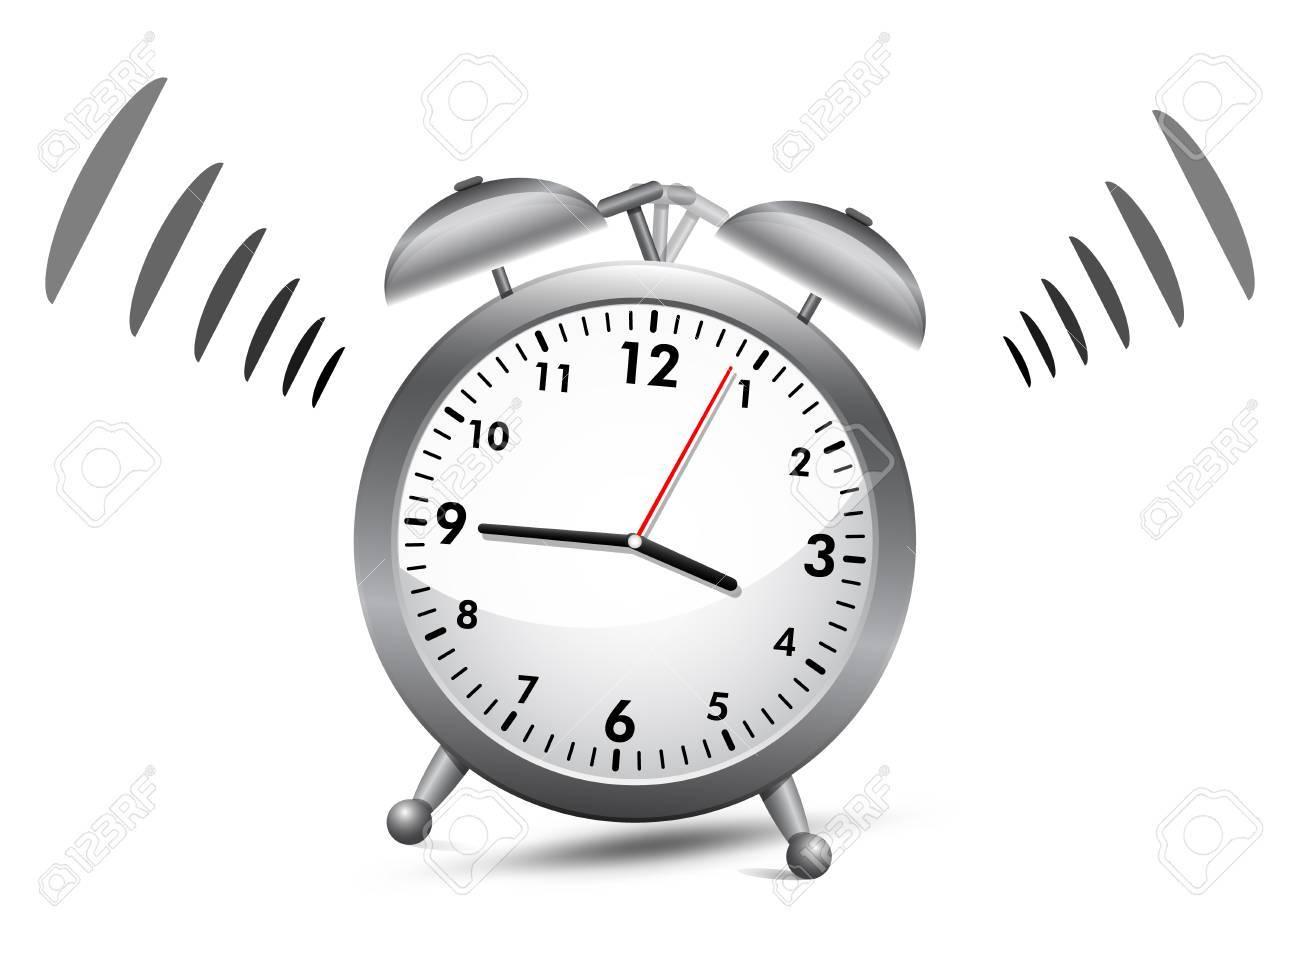 Silver analog alarm clock ringing